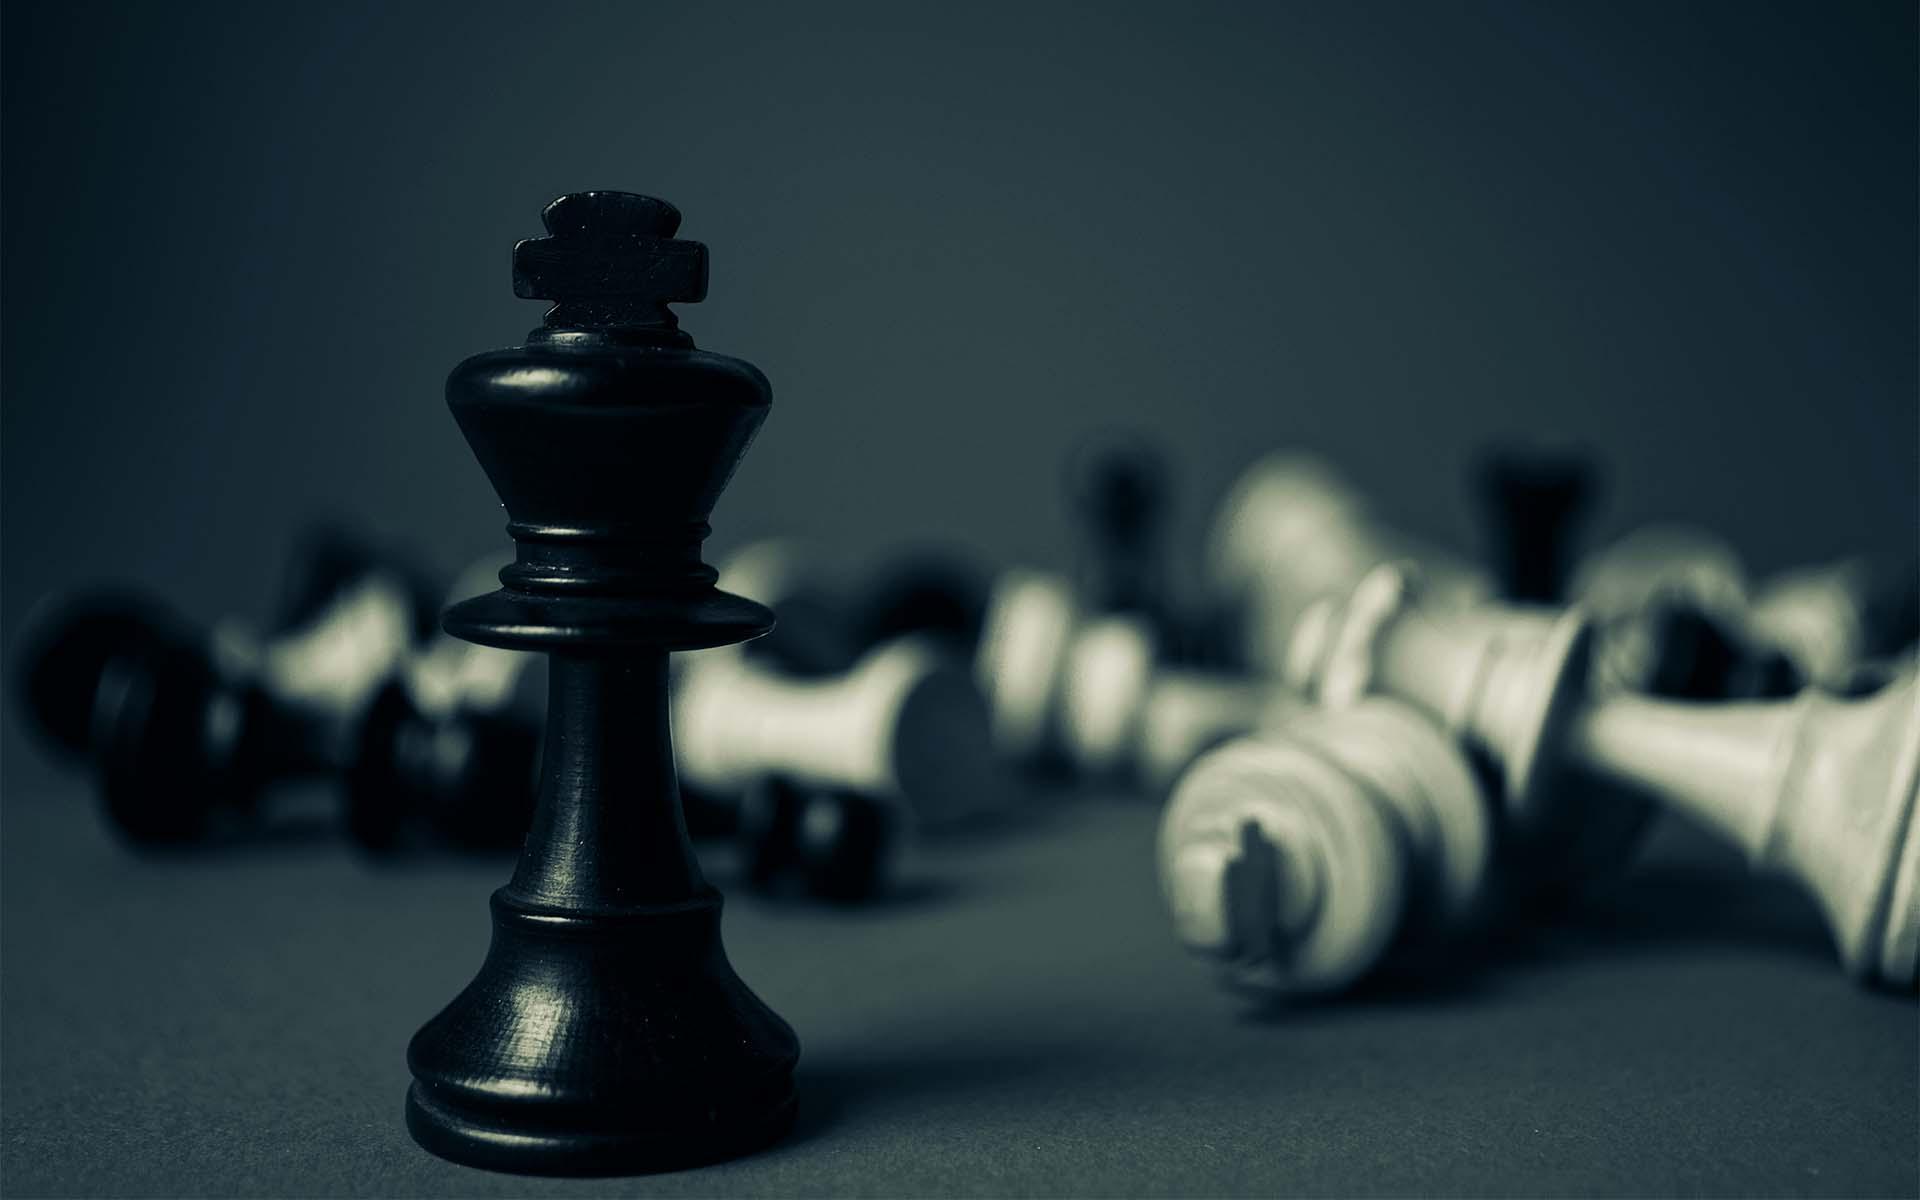 Move Over LocalBitcoins - Qvolta Aims to Dethrone Reigning P2P Crypto Exchange Platform